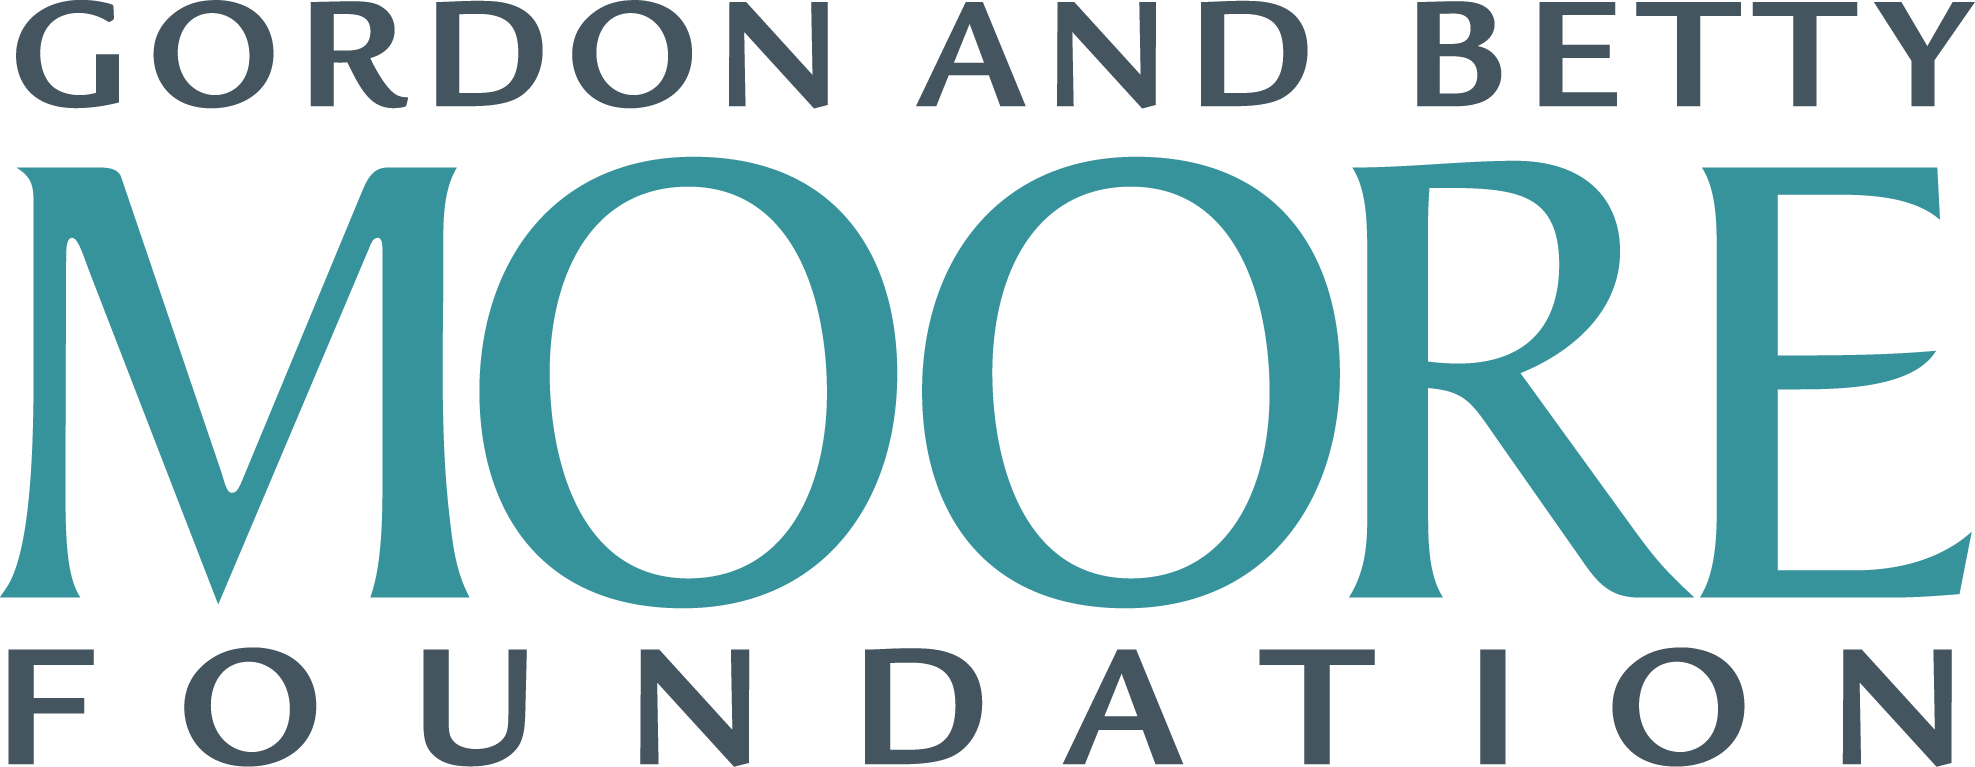 GordonandBettyMoore-logo-FINAL.png